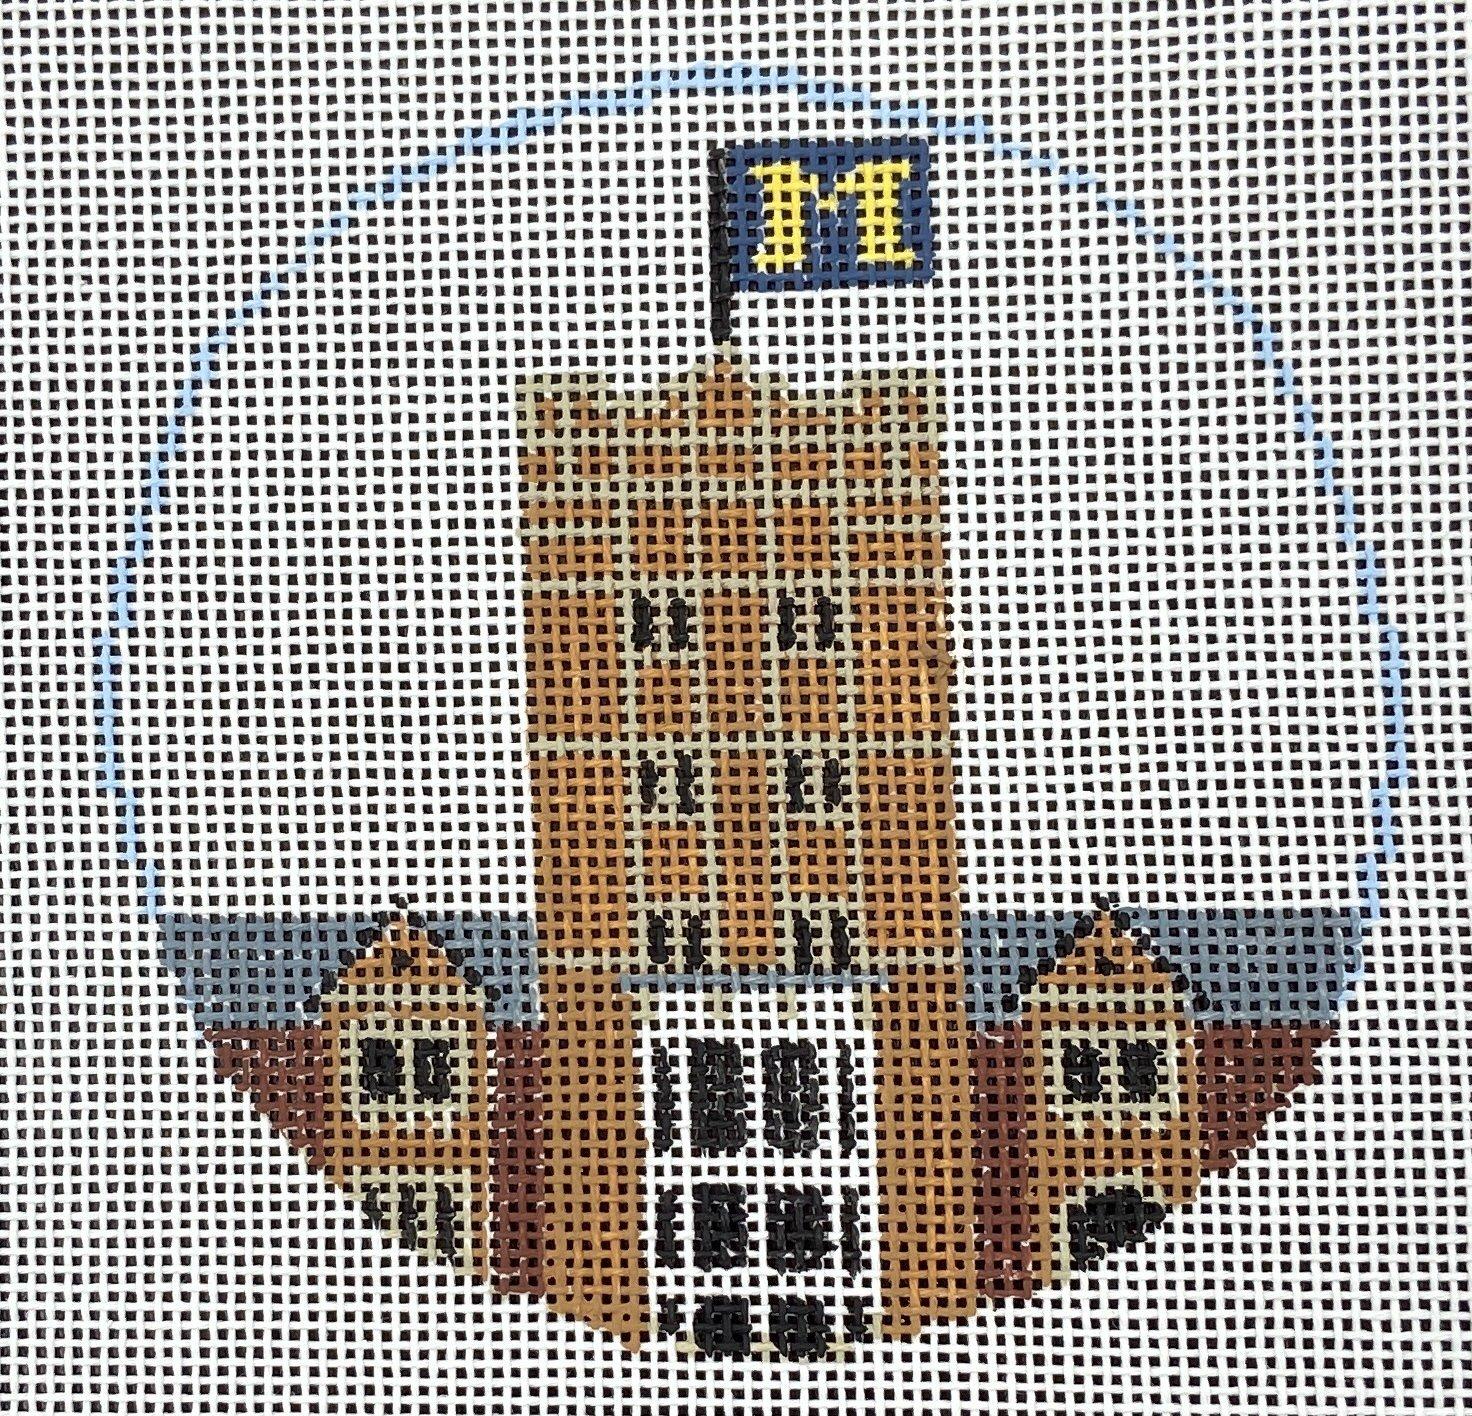 BT287 University of Michigan Union Building Kathy Schenkel